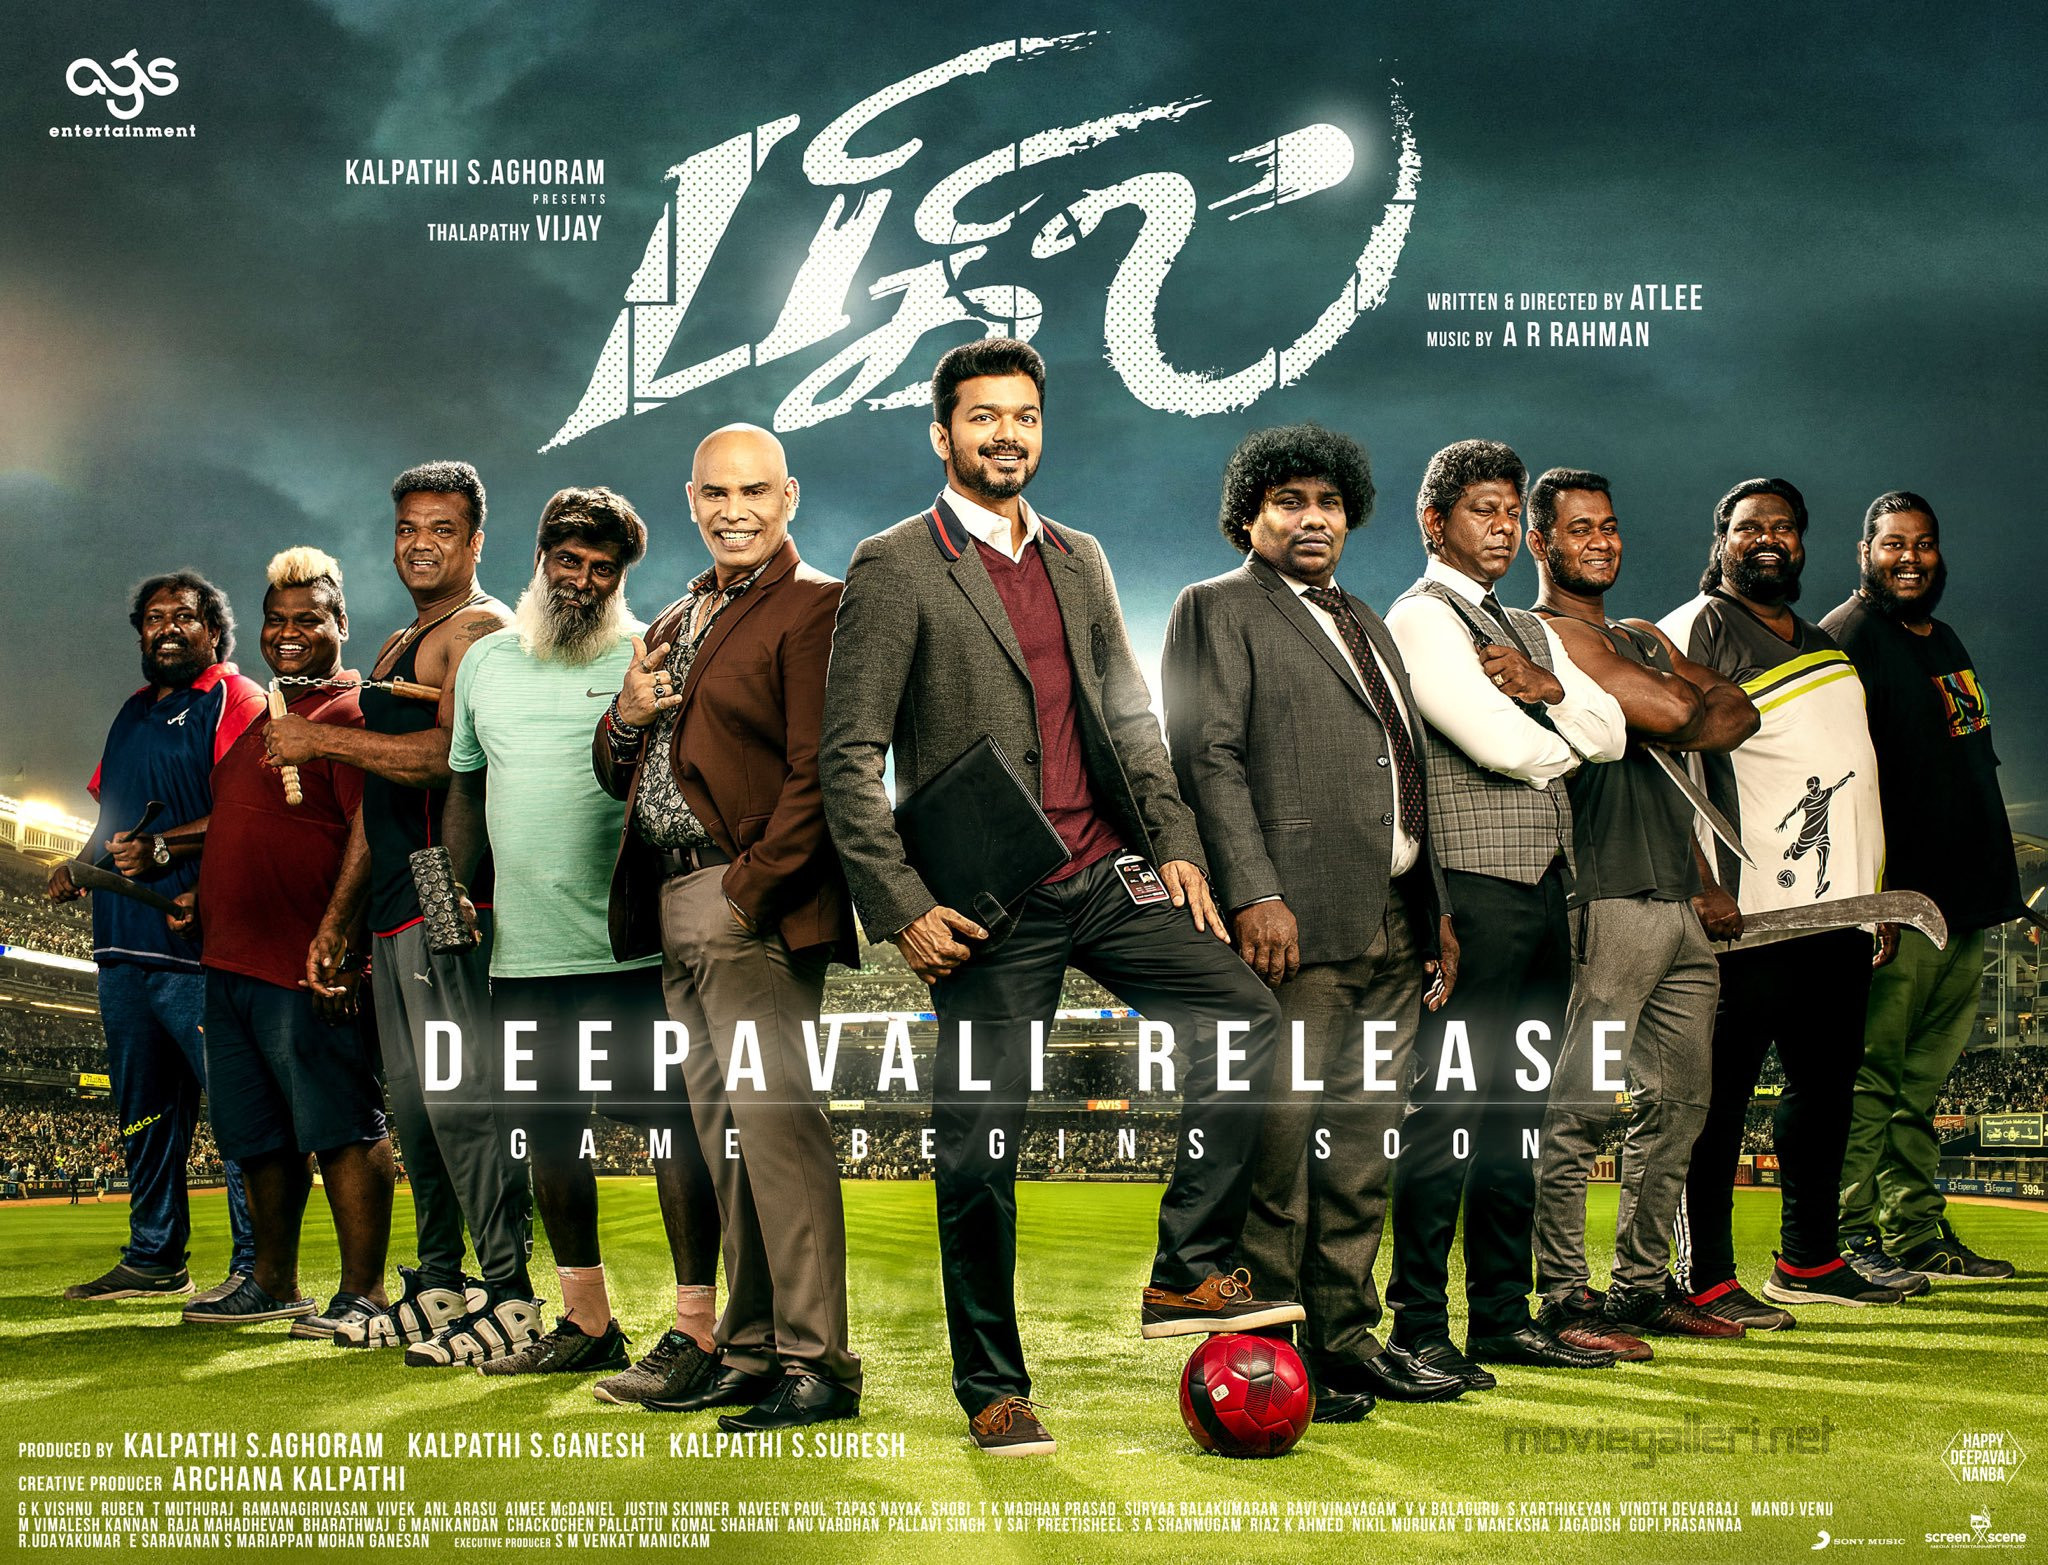 Thalapathy Vijay Bigil Movie Deepavali Release Poster HD